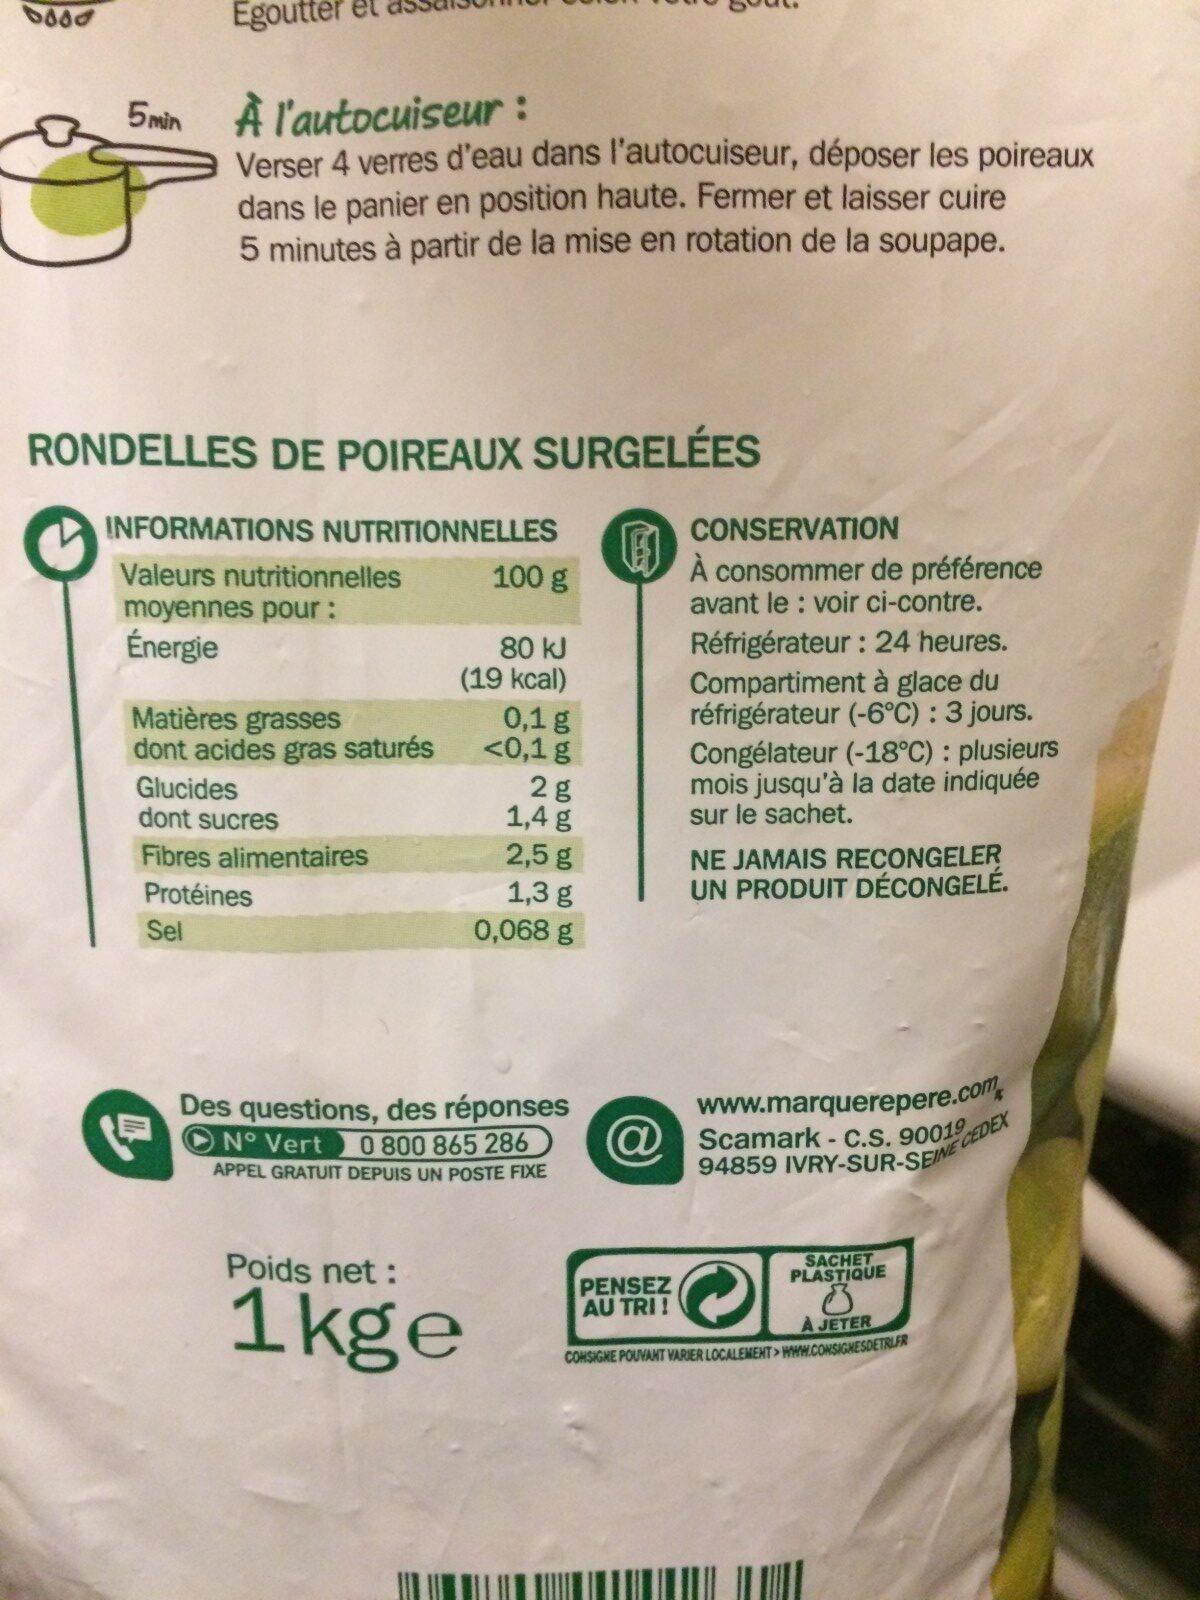 Poireaux en rondelles - Ingredients - fr